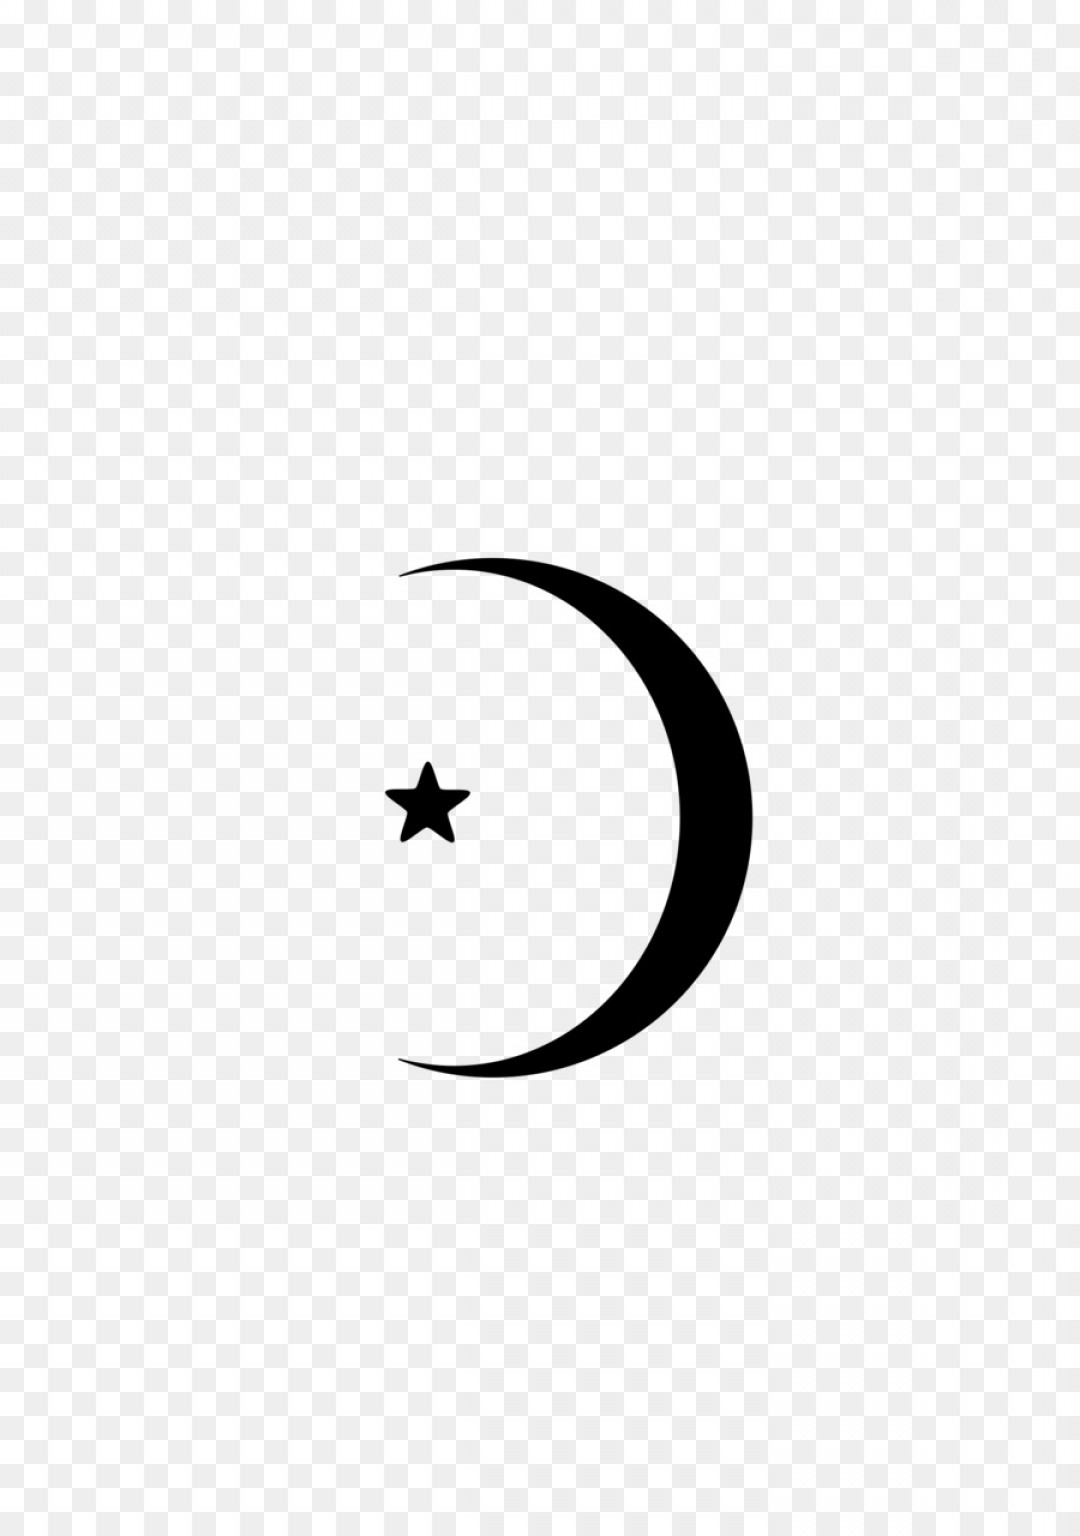 1080x1536 Crescent Moon Transparent Circle Vector Sohadacouri